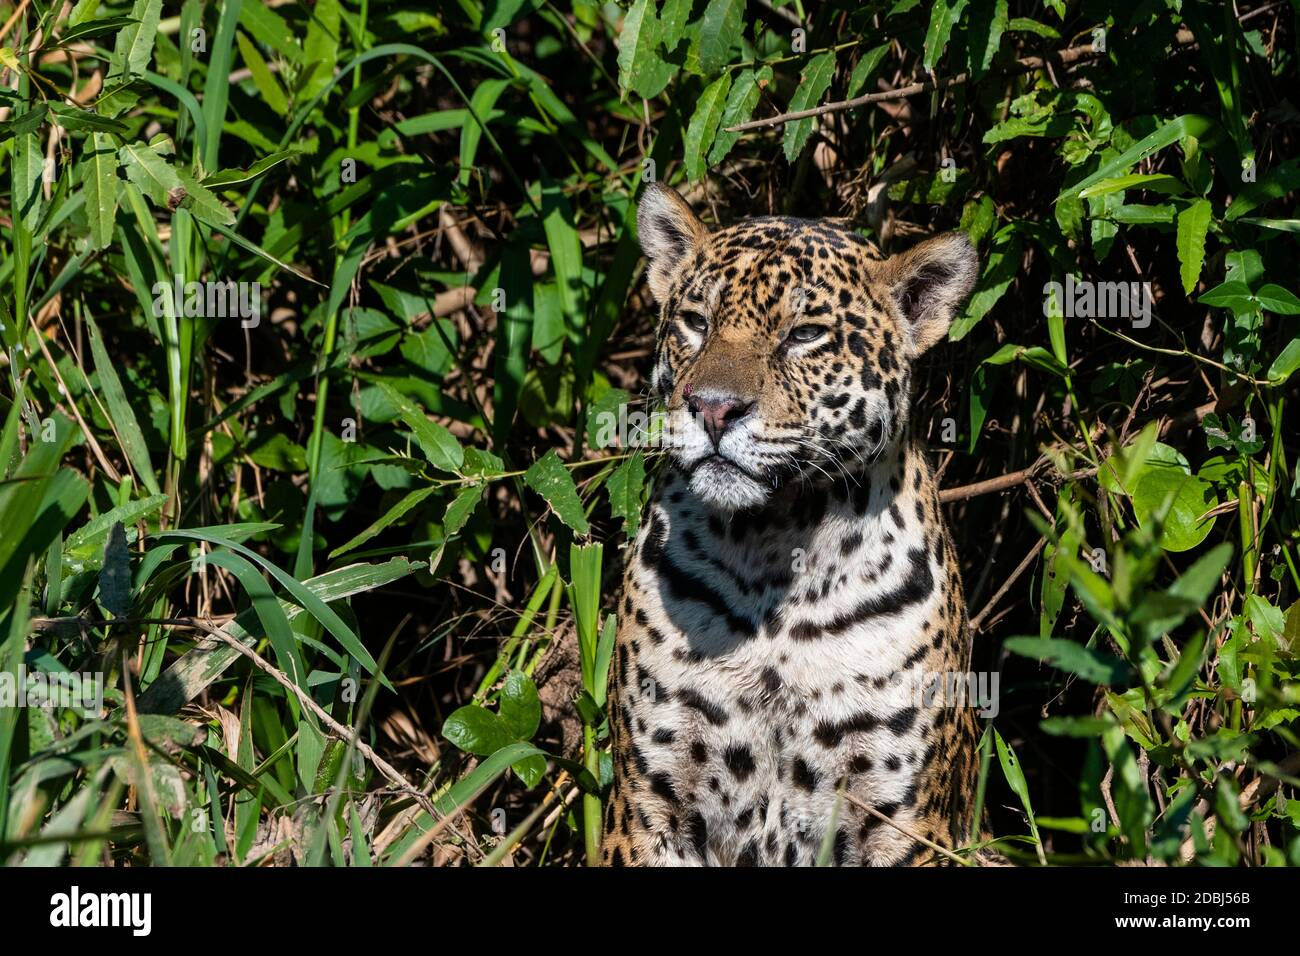 Jaguar (Panthera onca), el Pantanal de Mato Grosso, Mato Grosso, Brasil, América del Sur Foto de stock